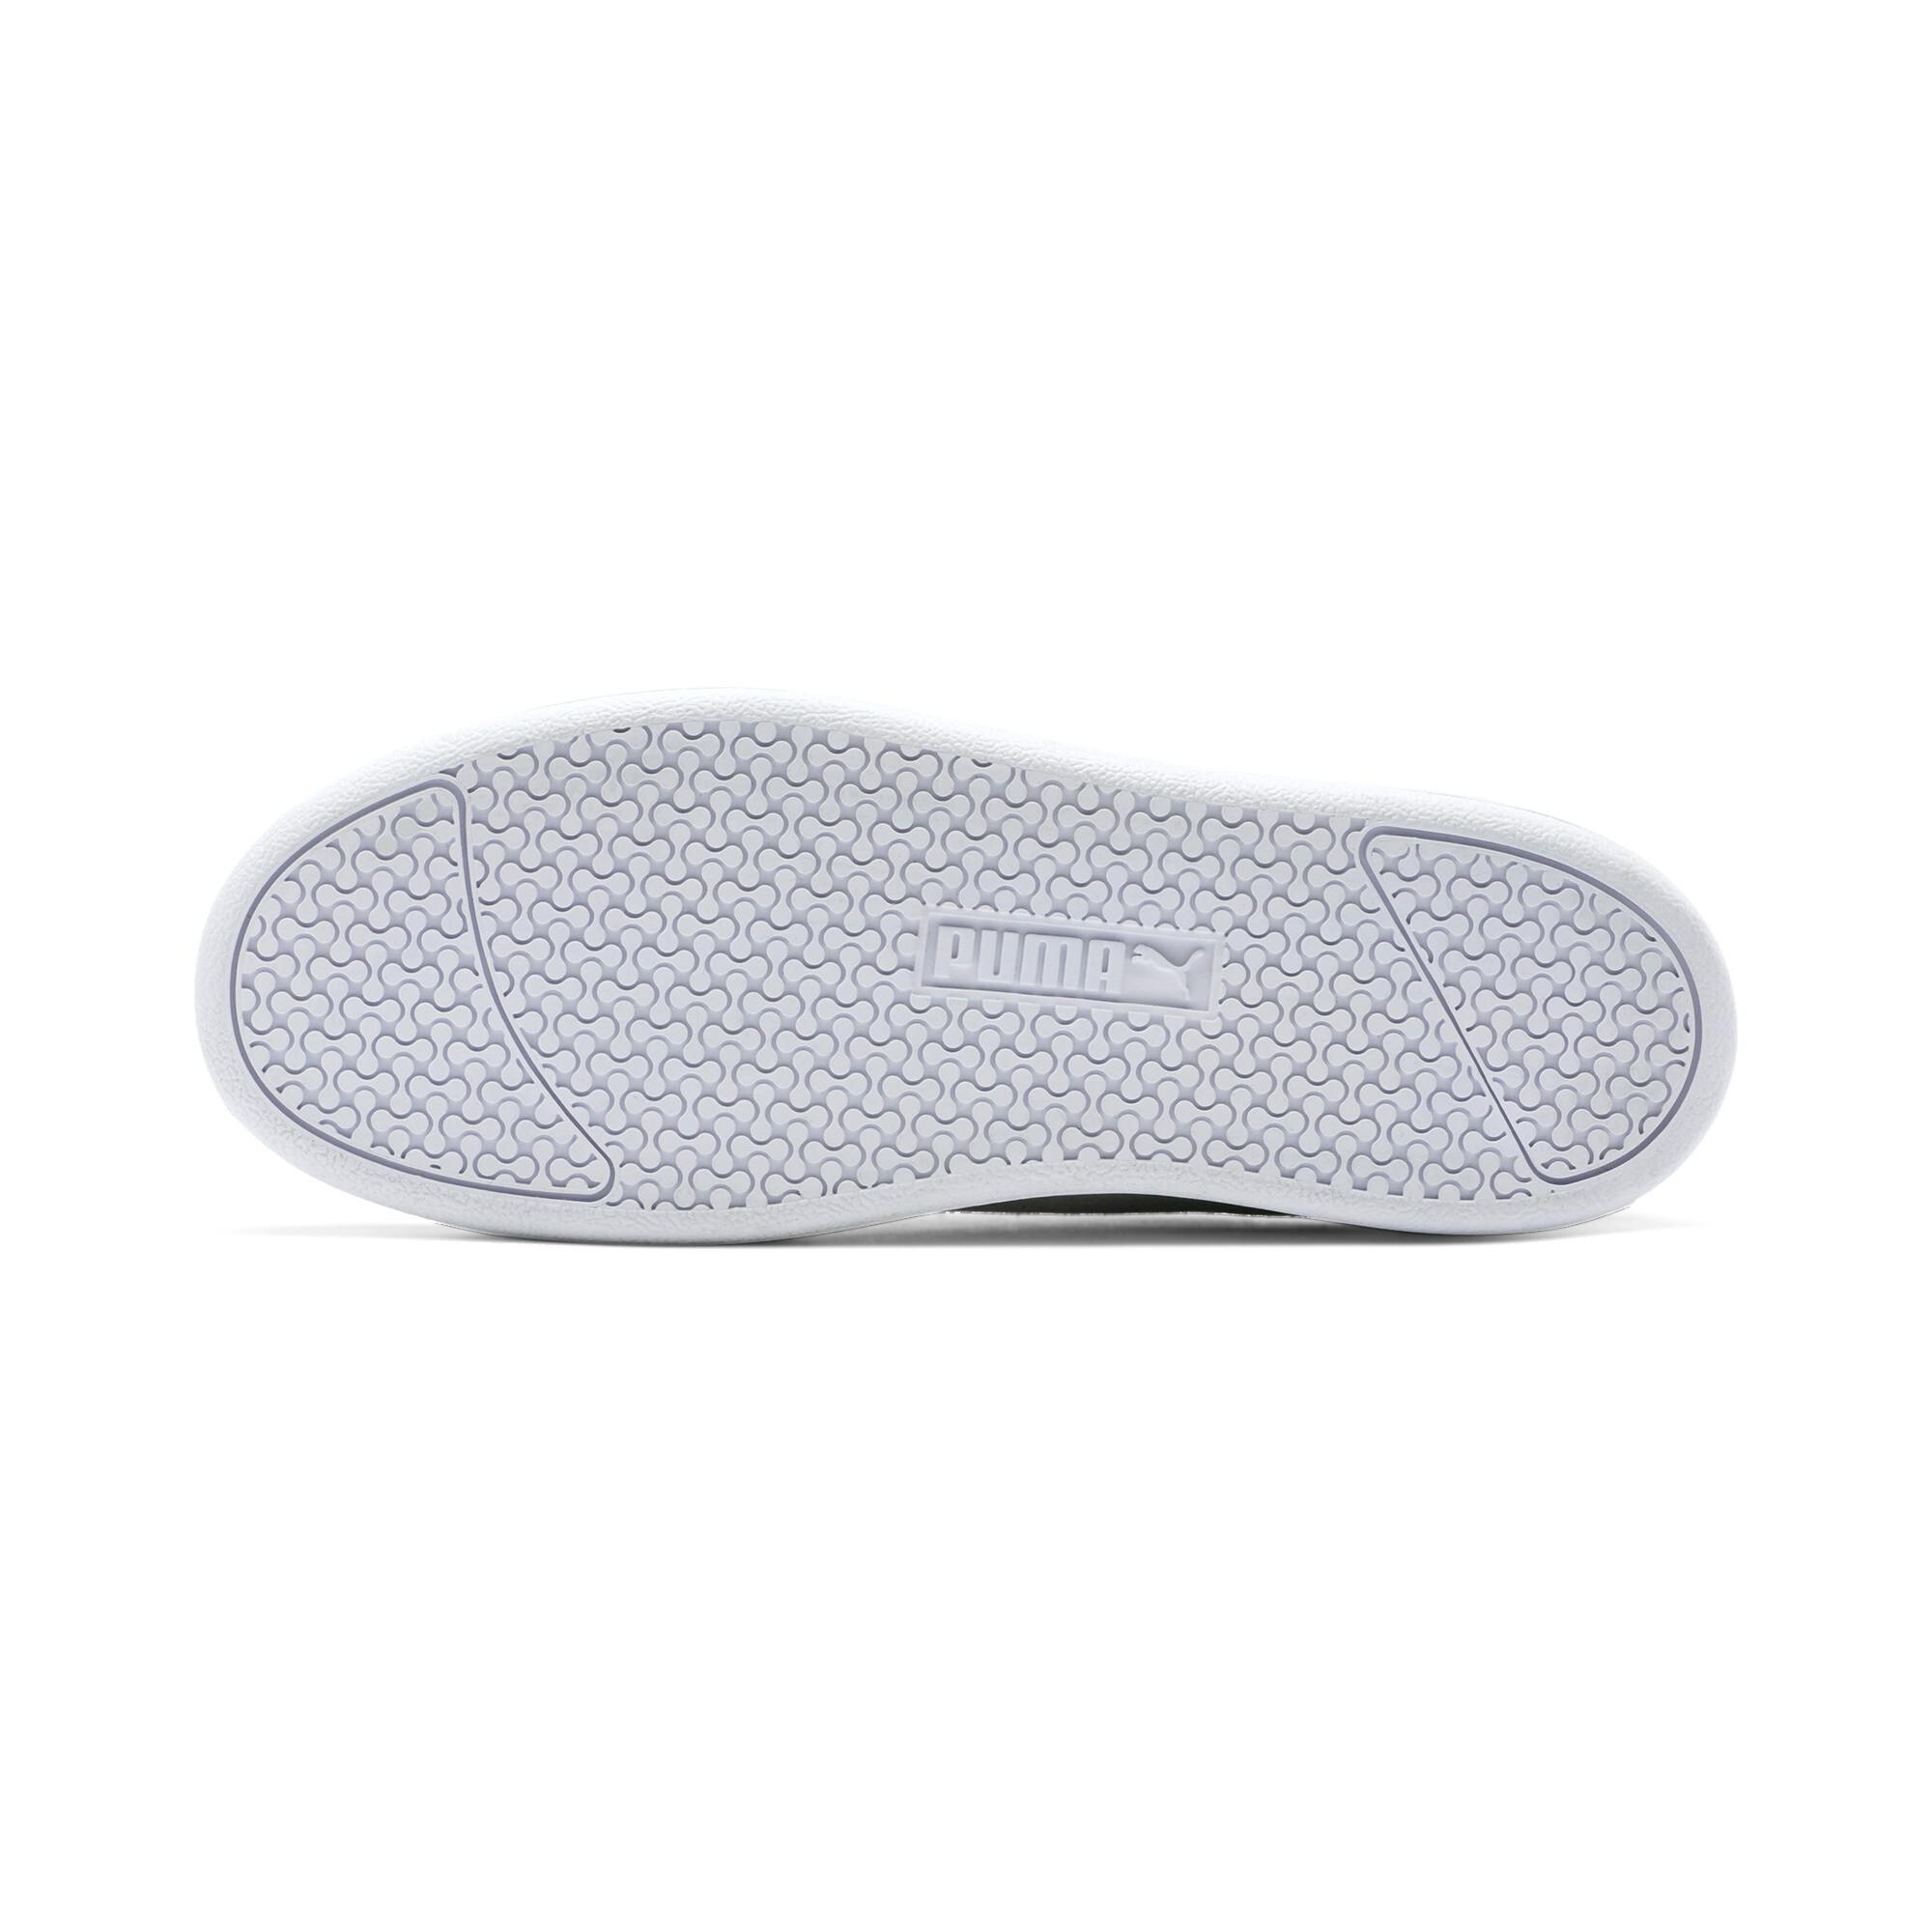 PUMA-Smash-Platform-Leather-Women-039-s-Sneakers-Women-Shoe-Basics thumbnail 20